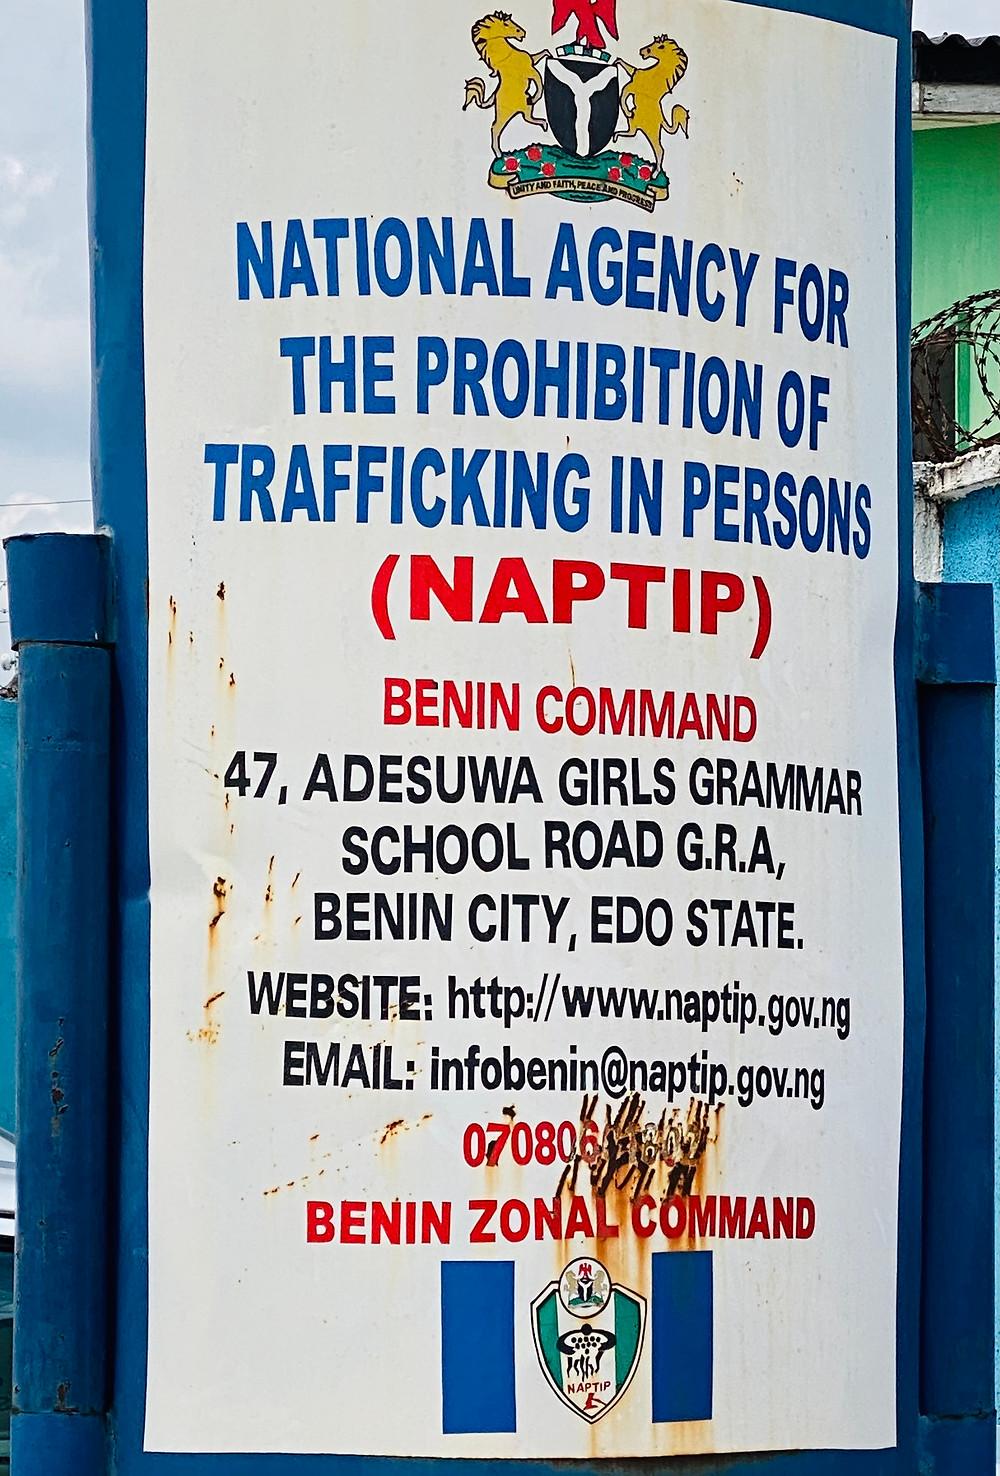 The NAPTIP sign in the city of Benin, in Nigeria